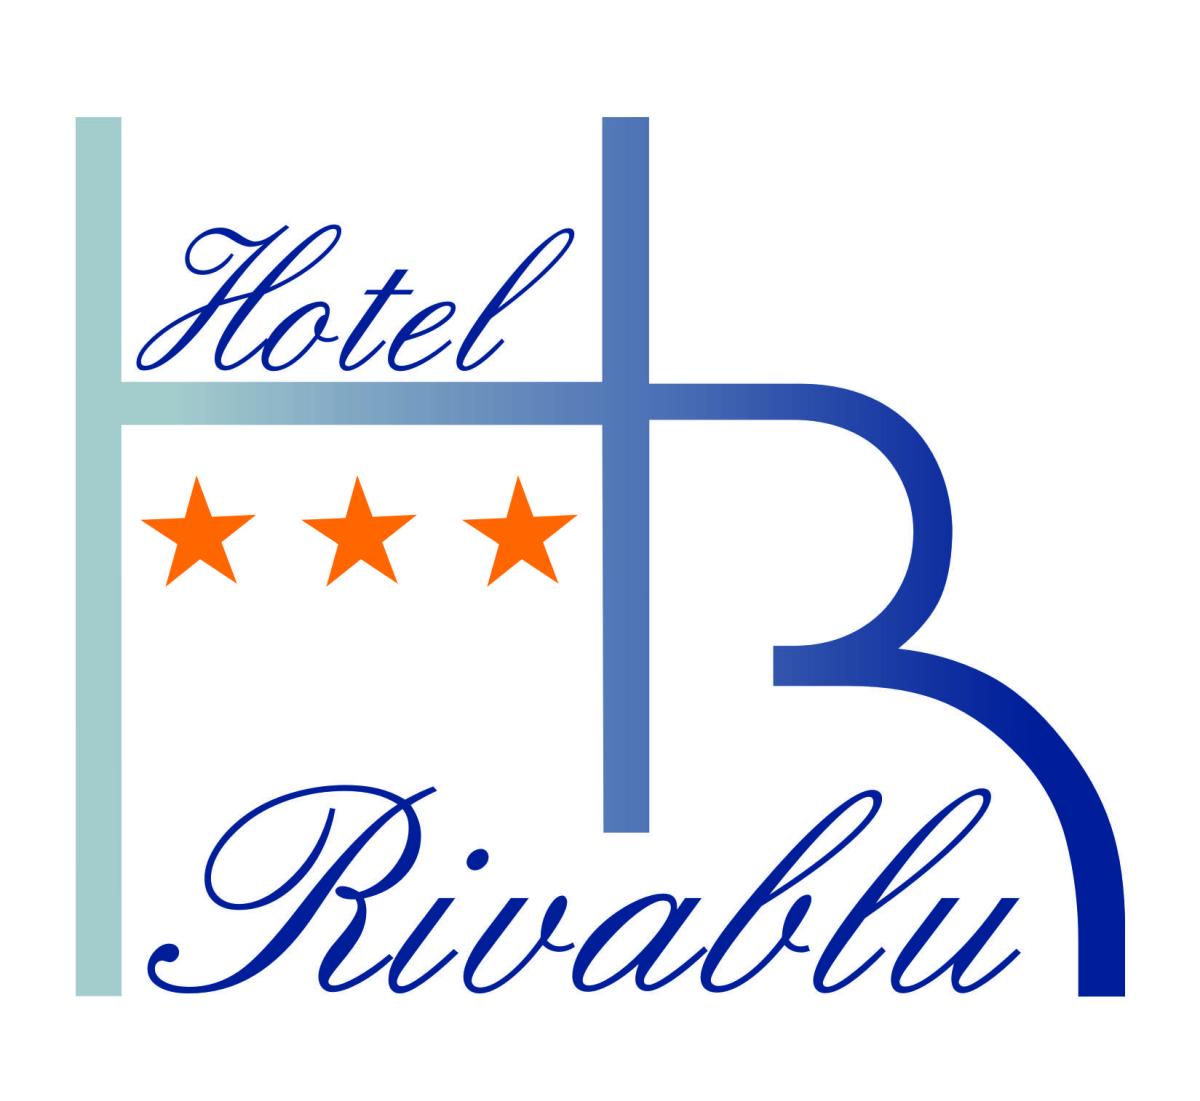 Hotel Rivablu